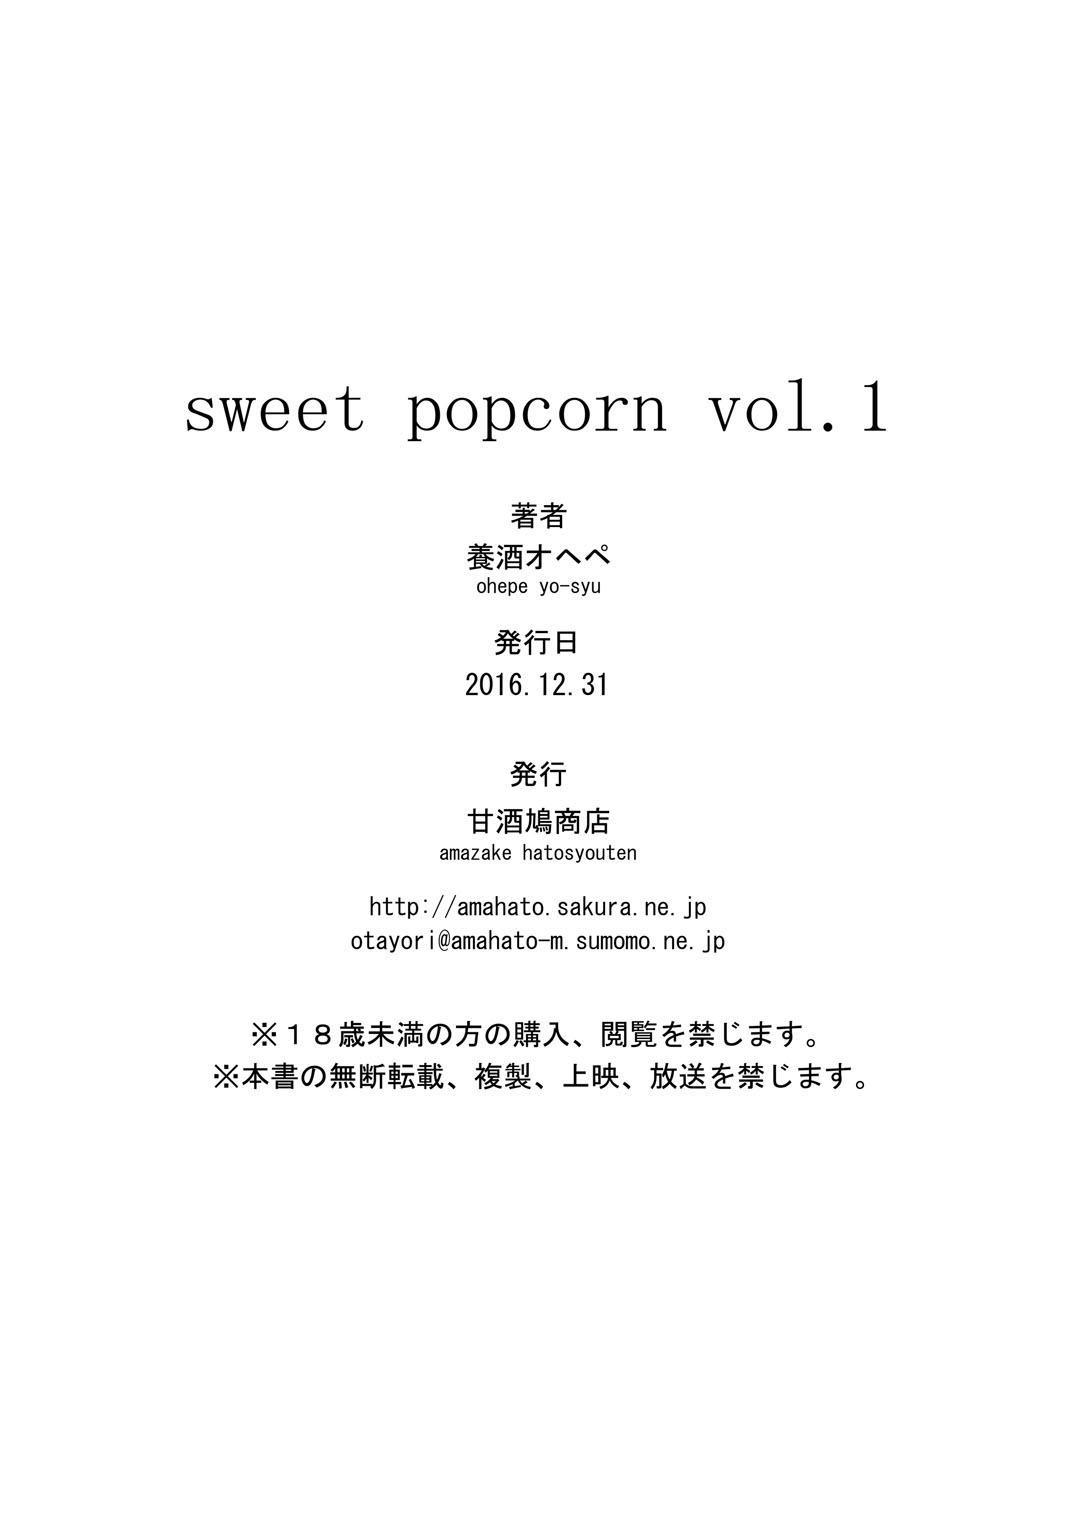 sweet popcorn vol. 1 23